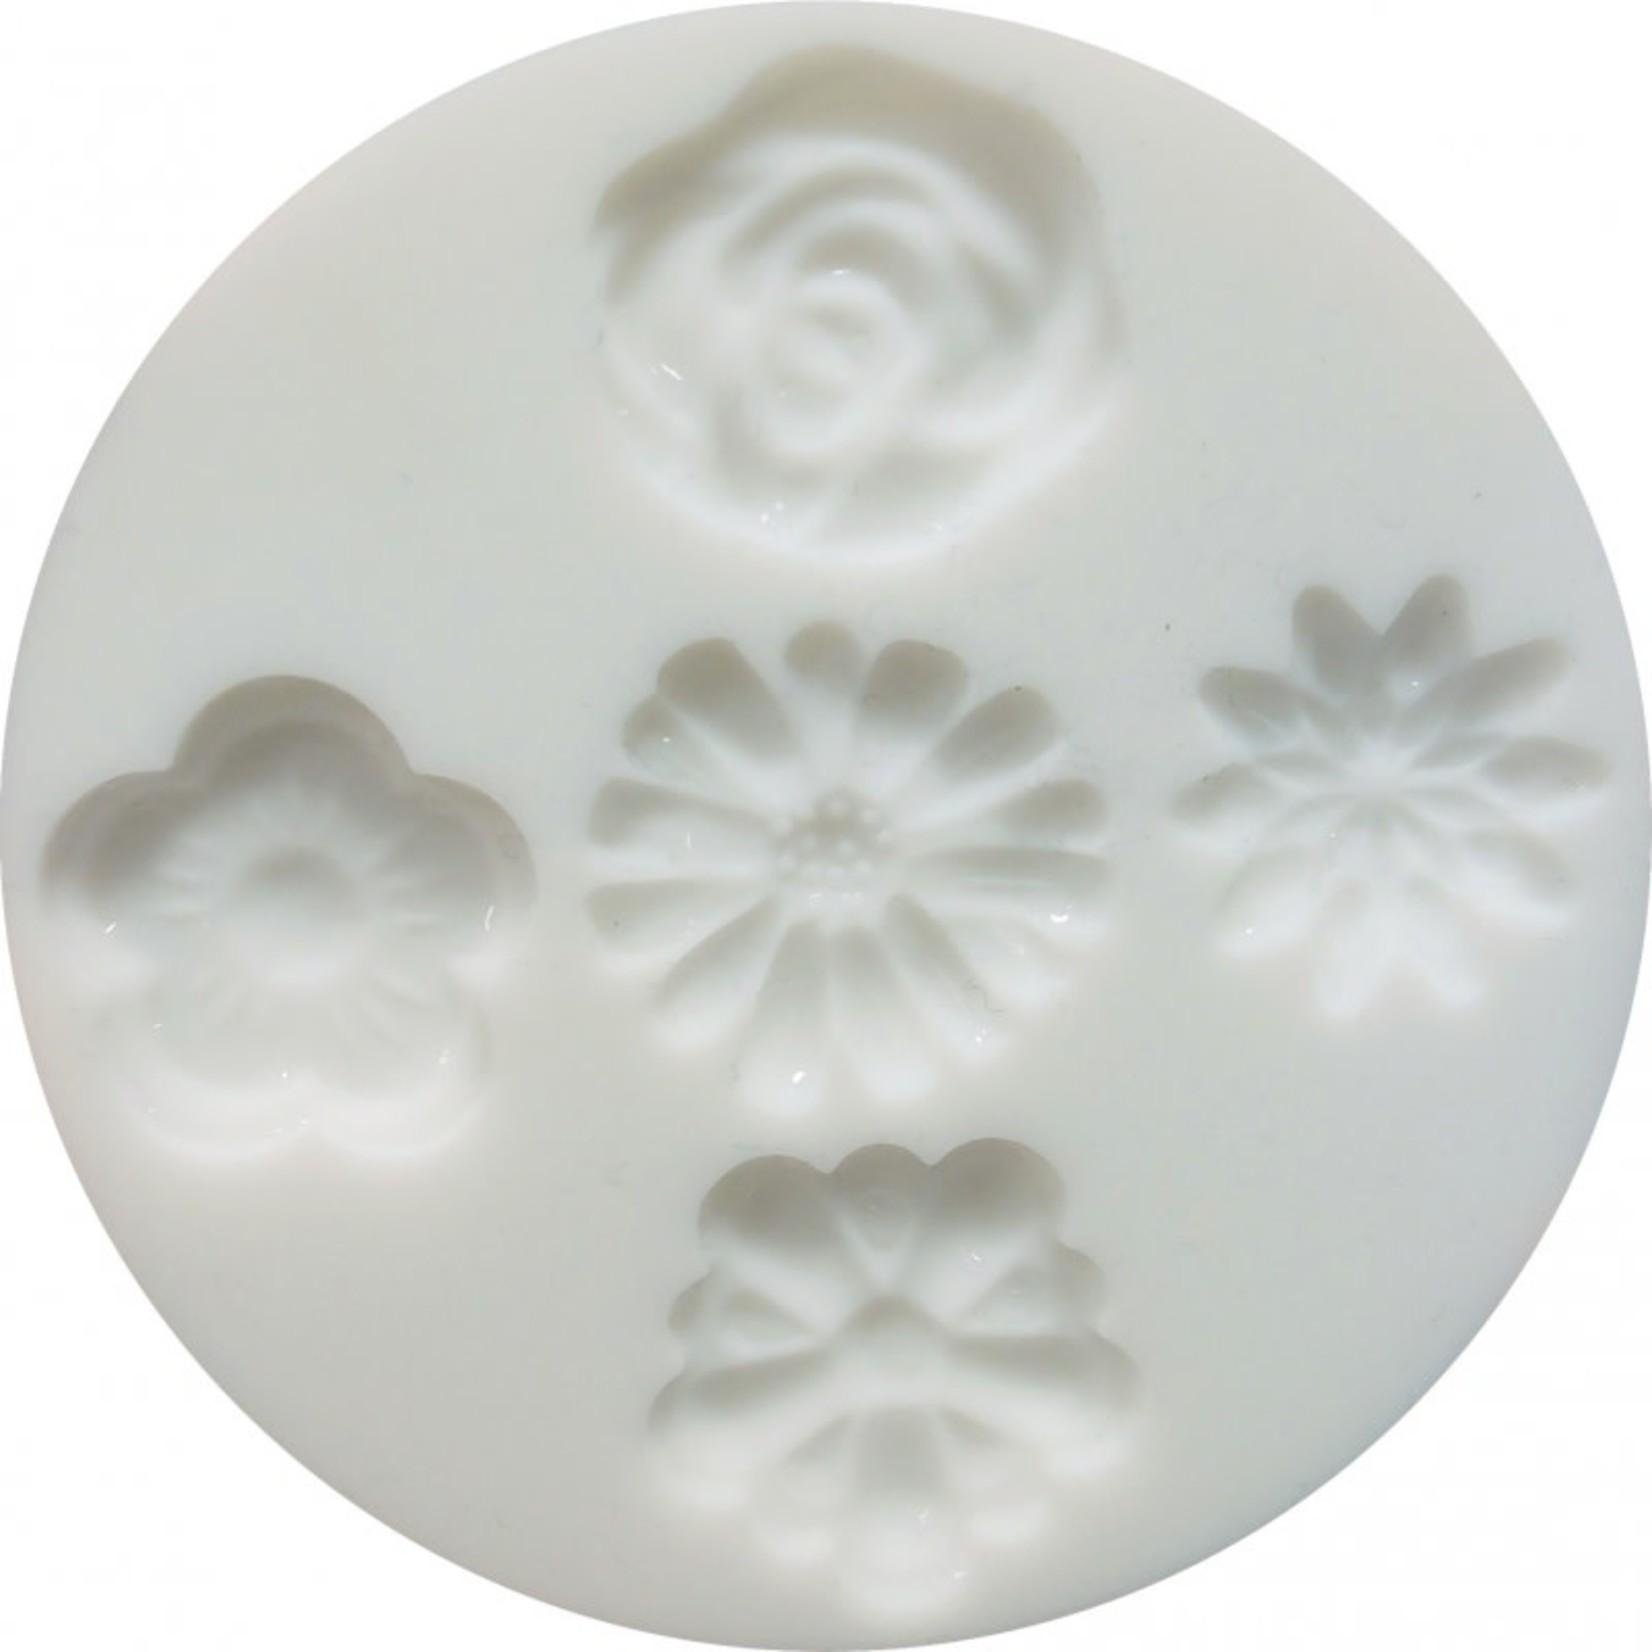 Cernit Cernit Silicone Mold - Flowers